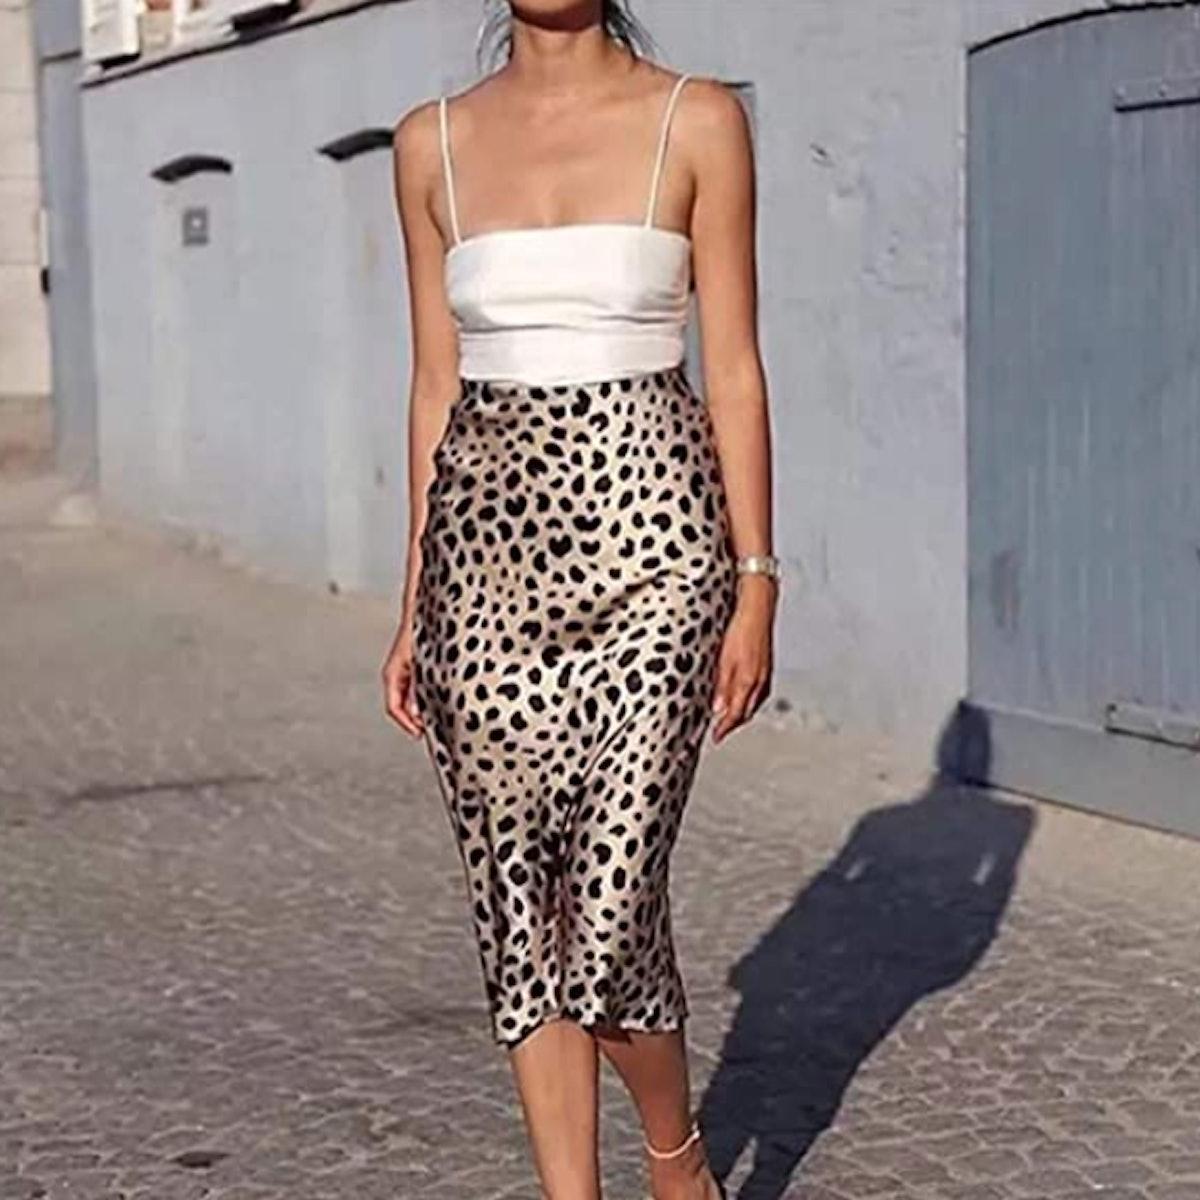 Soowalaoo Printed Satin Skirt